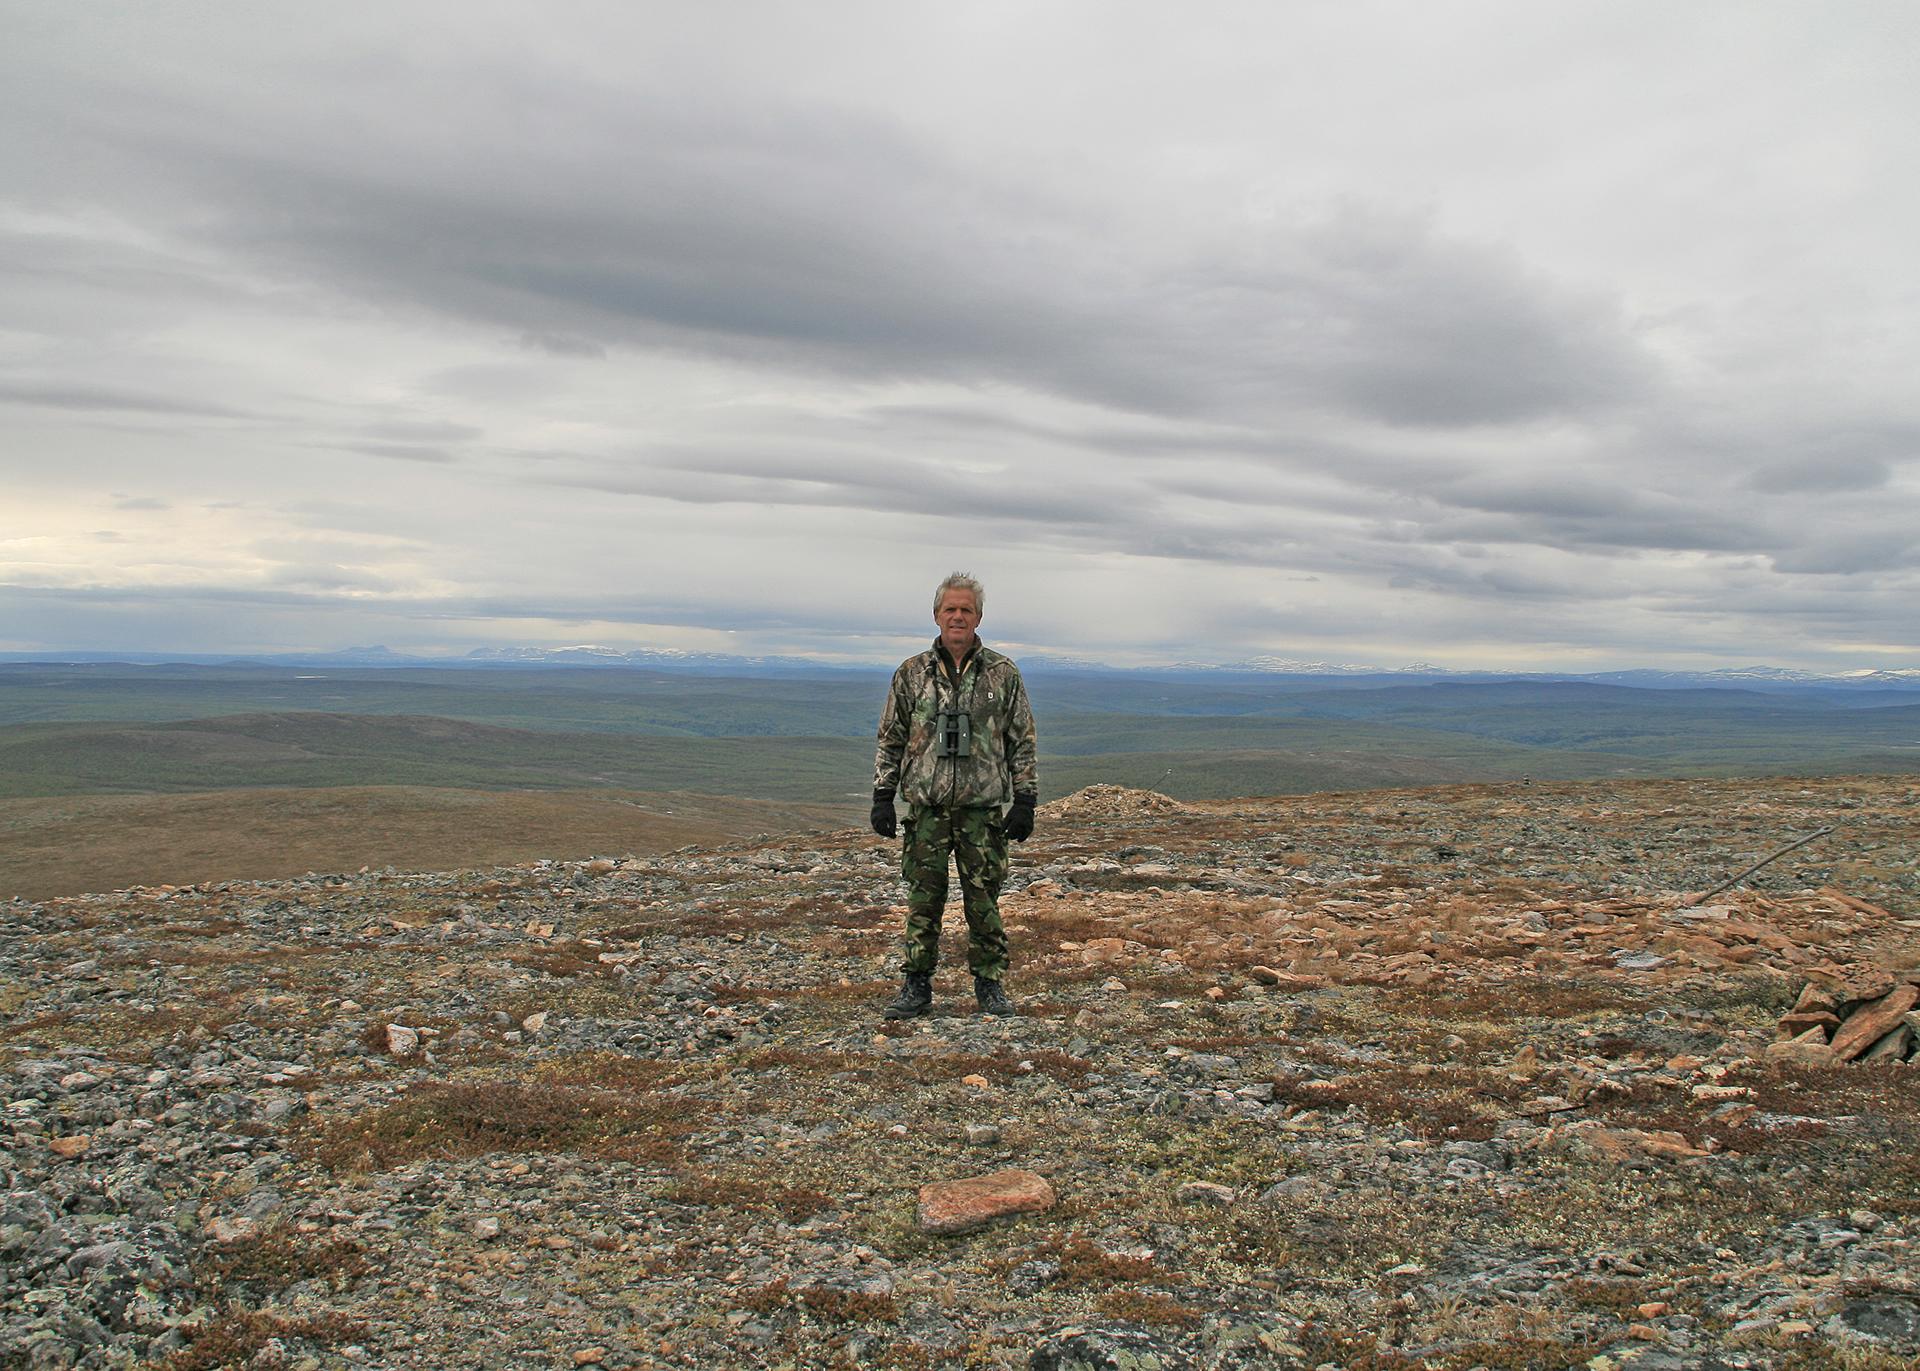 Mount Ailegas Karigasniemi Finland, June 2010